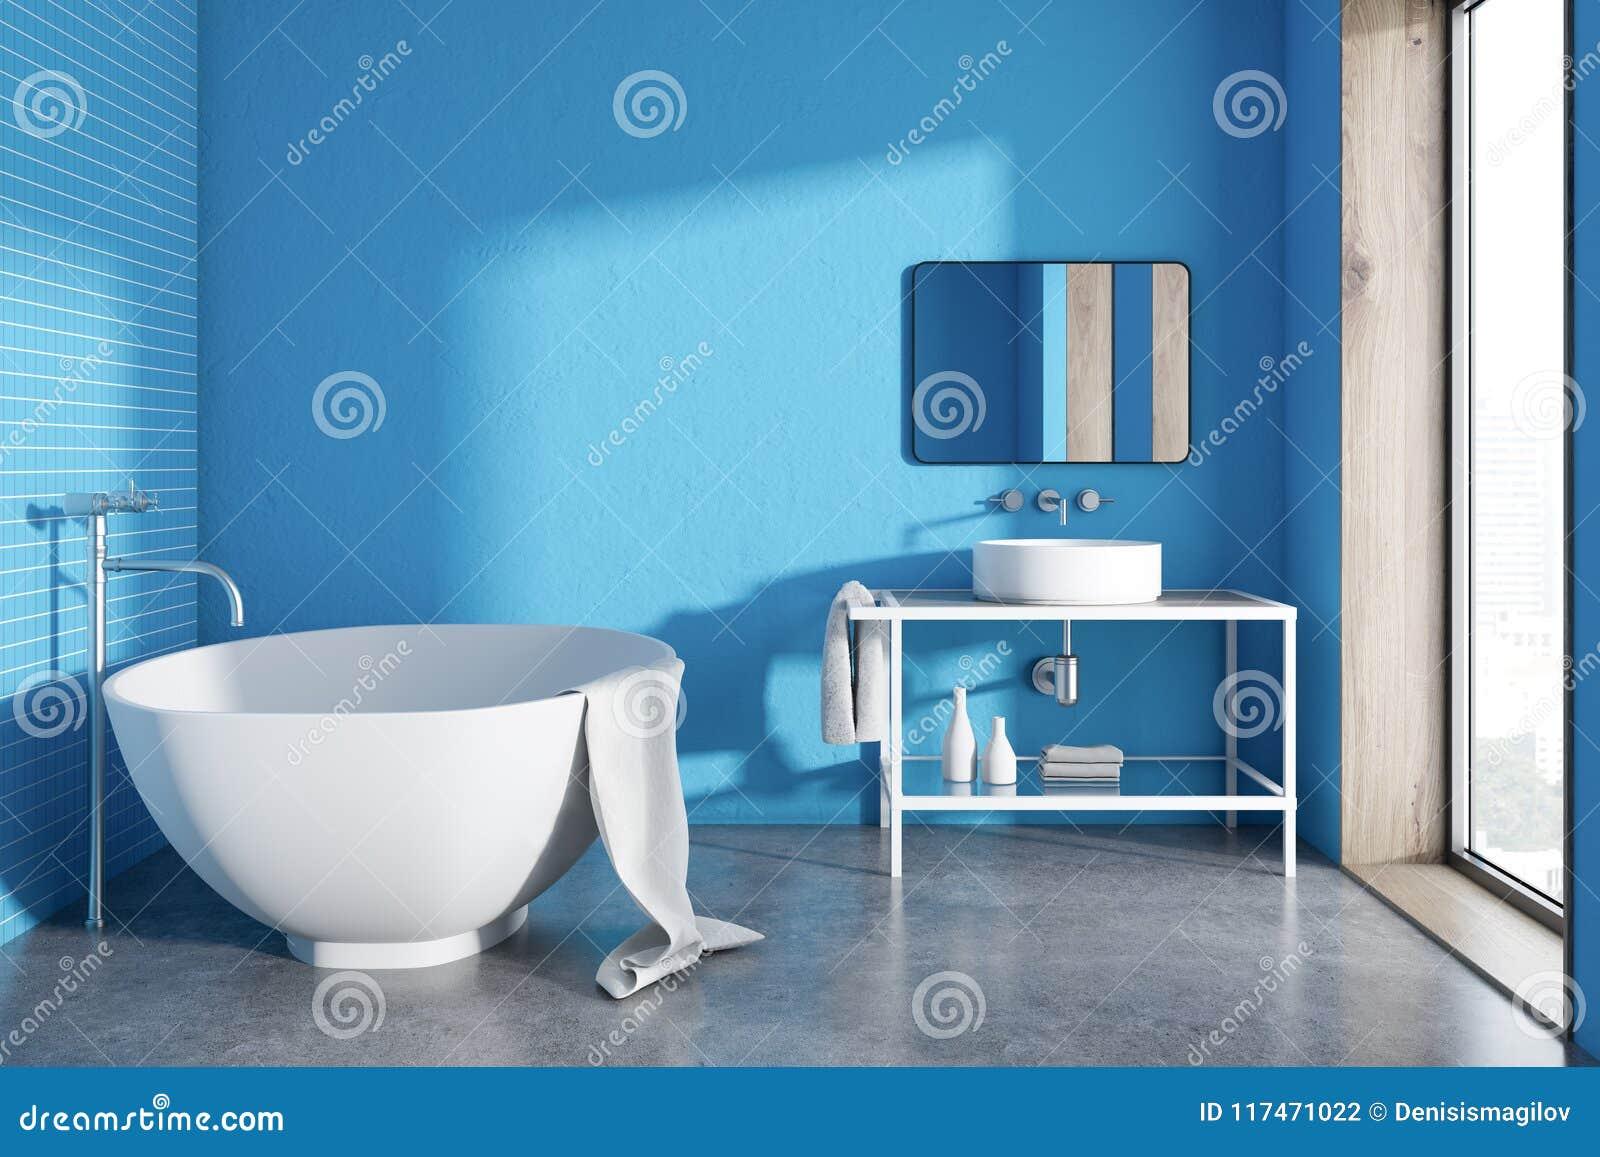 Round Bathtub Blue Bathroom Interior Stock Illustration ...